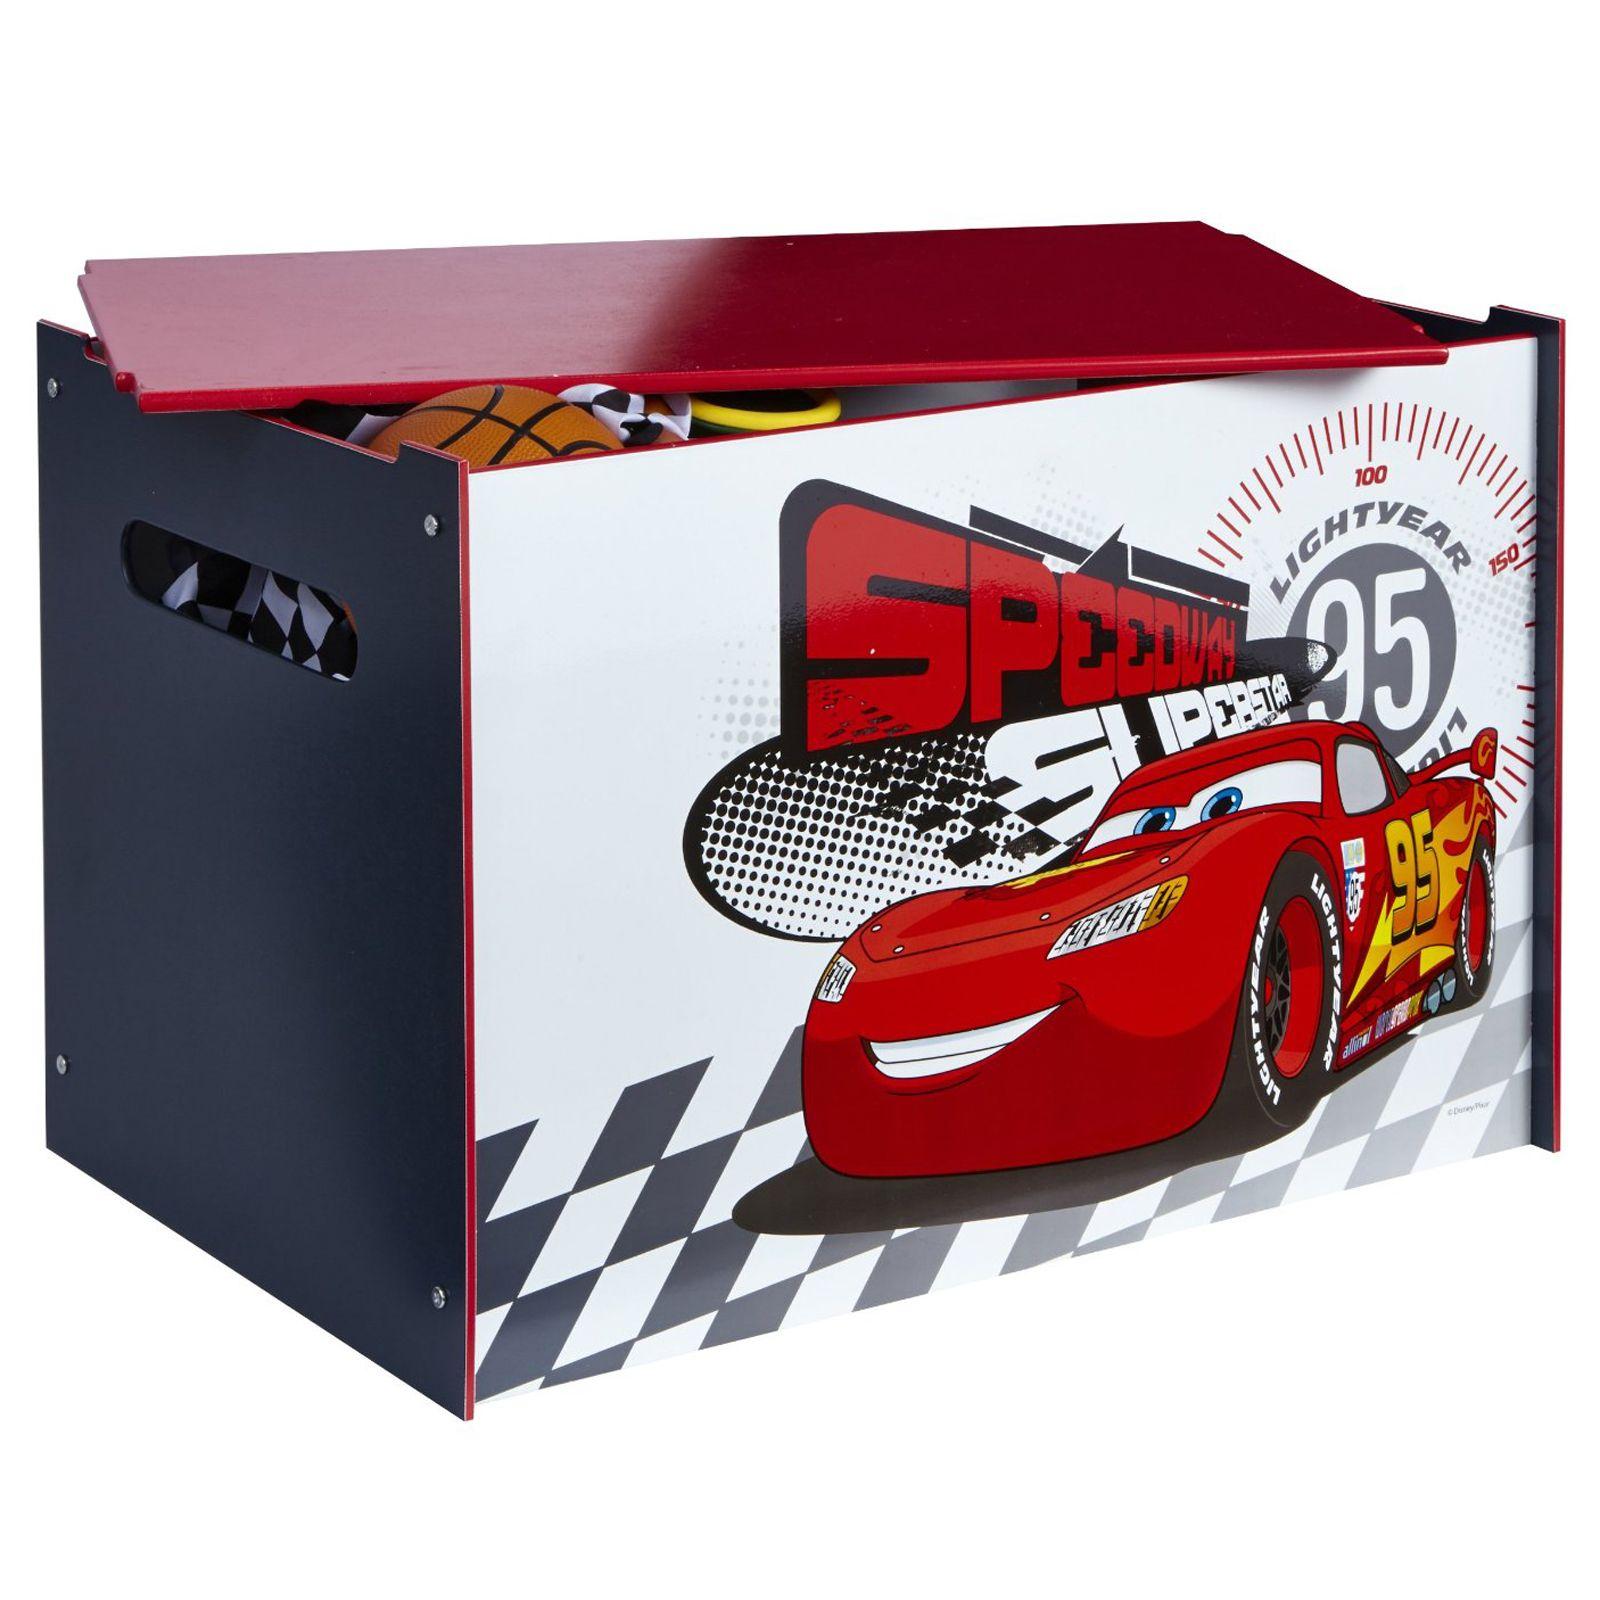 My Little Pony Metal Toy Storage Unit Box Organiser Kids: CHARACTER & DISNEY TOY BOX BEDROOM STORAGE